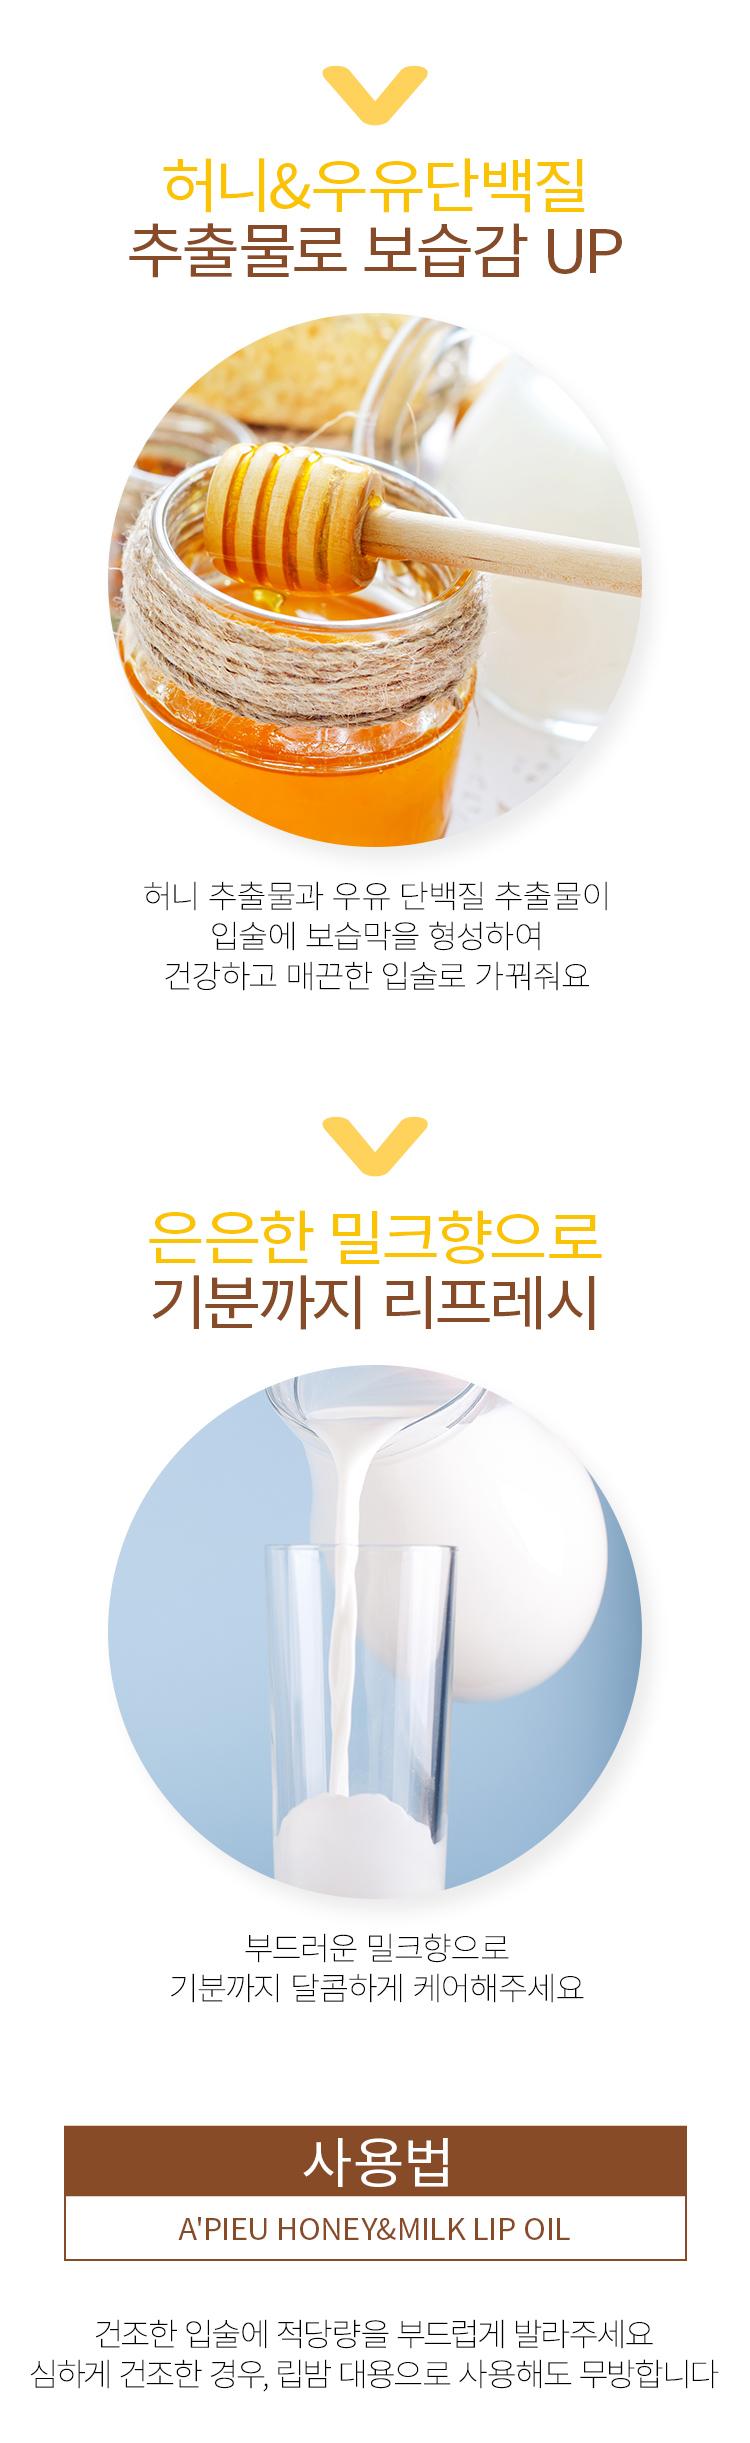 APIEU_Honey_Milk_Lip_Oil_03.jpg